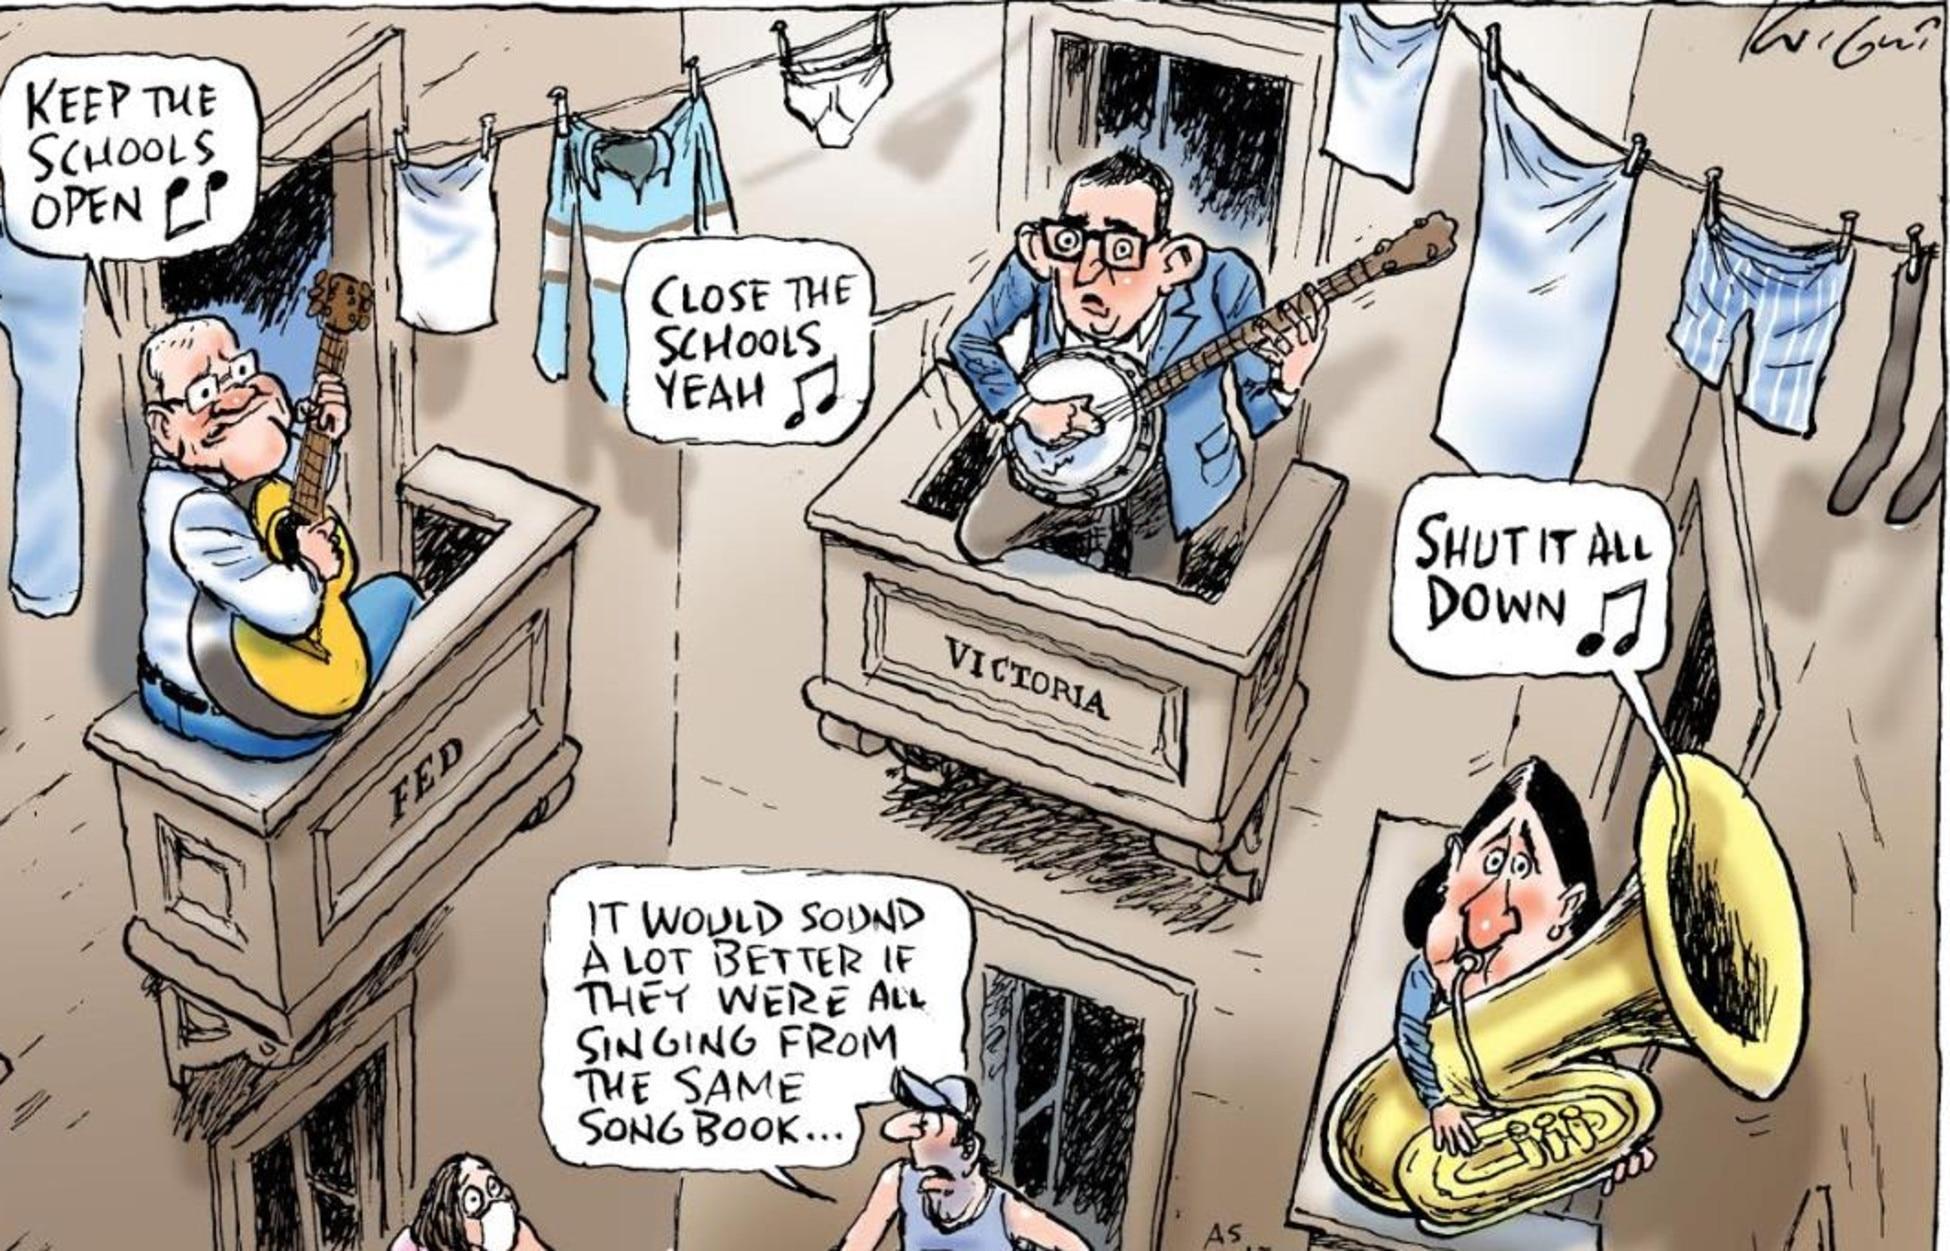 Mark Knight cartoon about covid-19 school closure confusion.